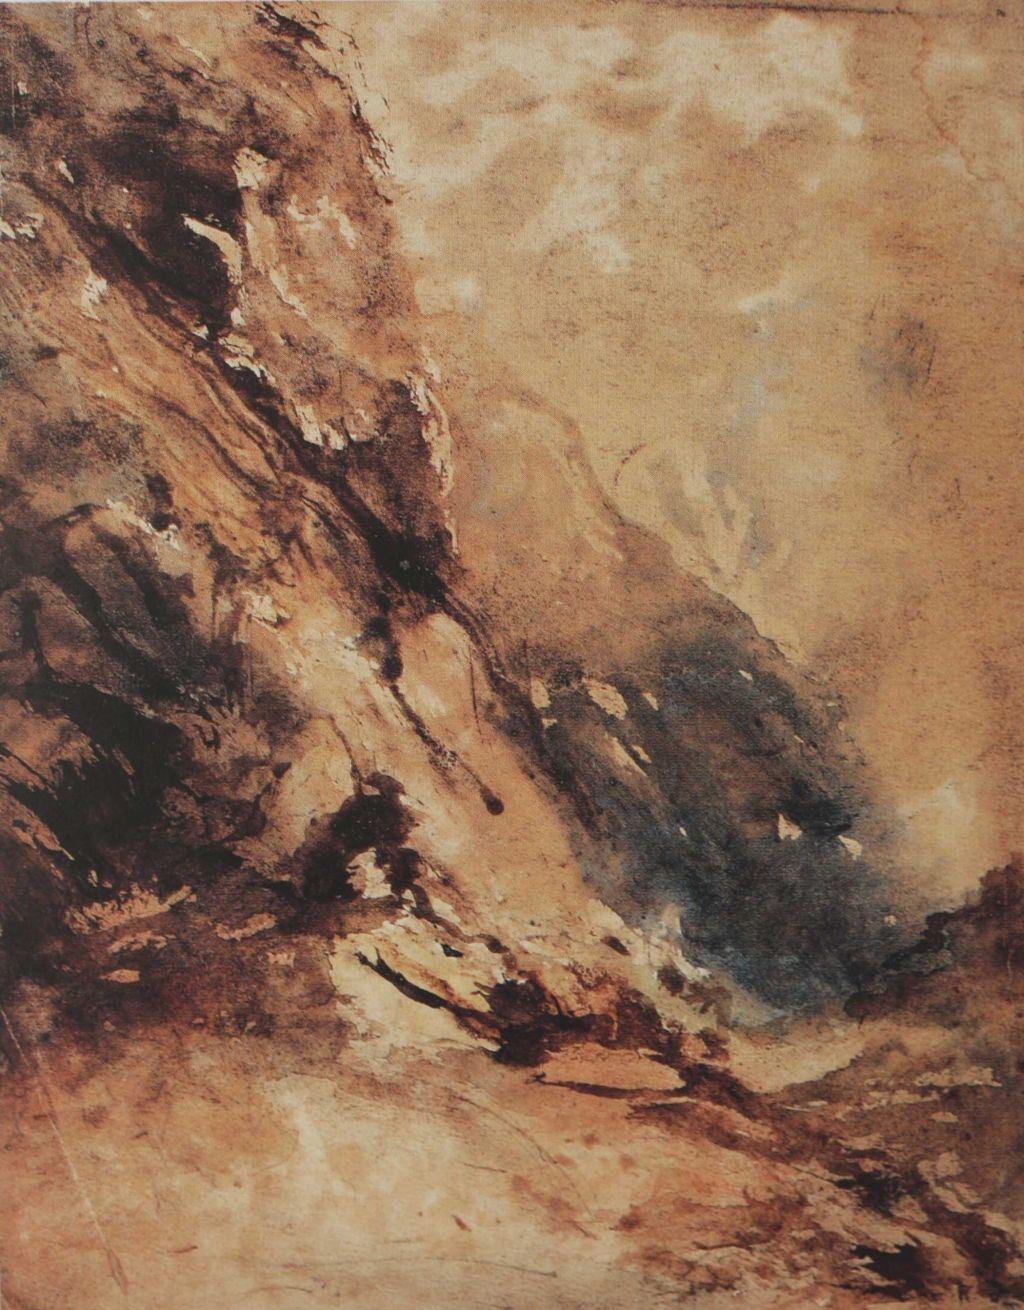 Paisatge, Eugenio Lucas Velázquez